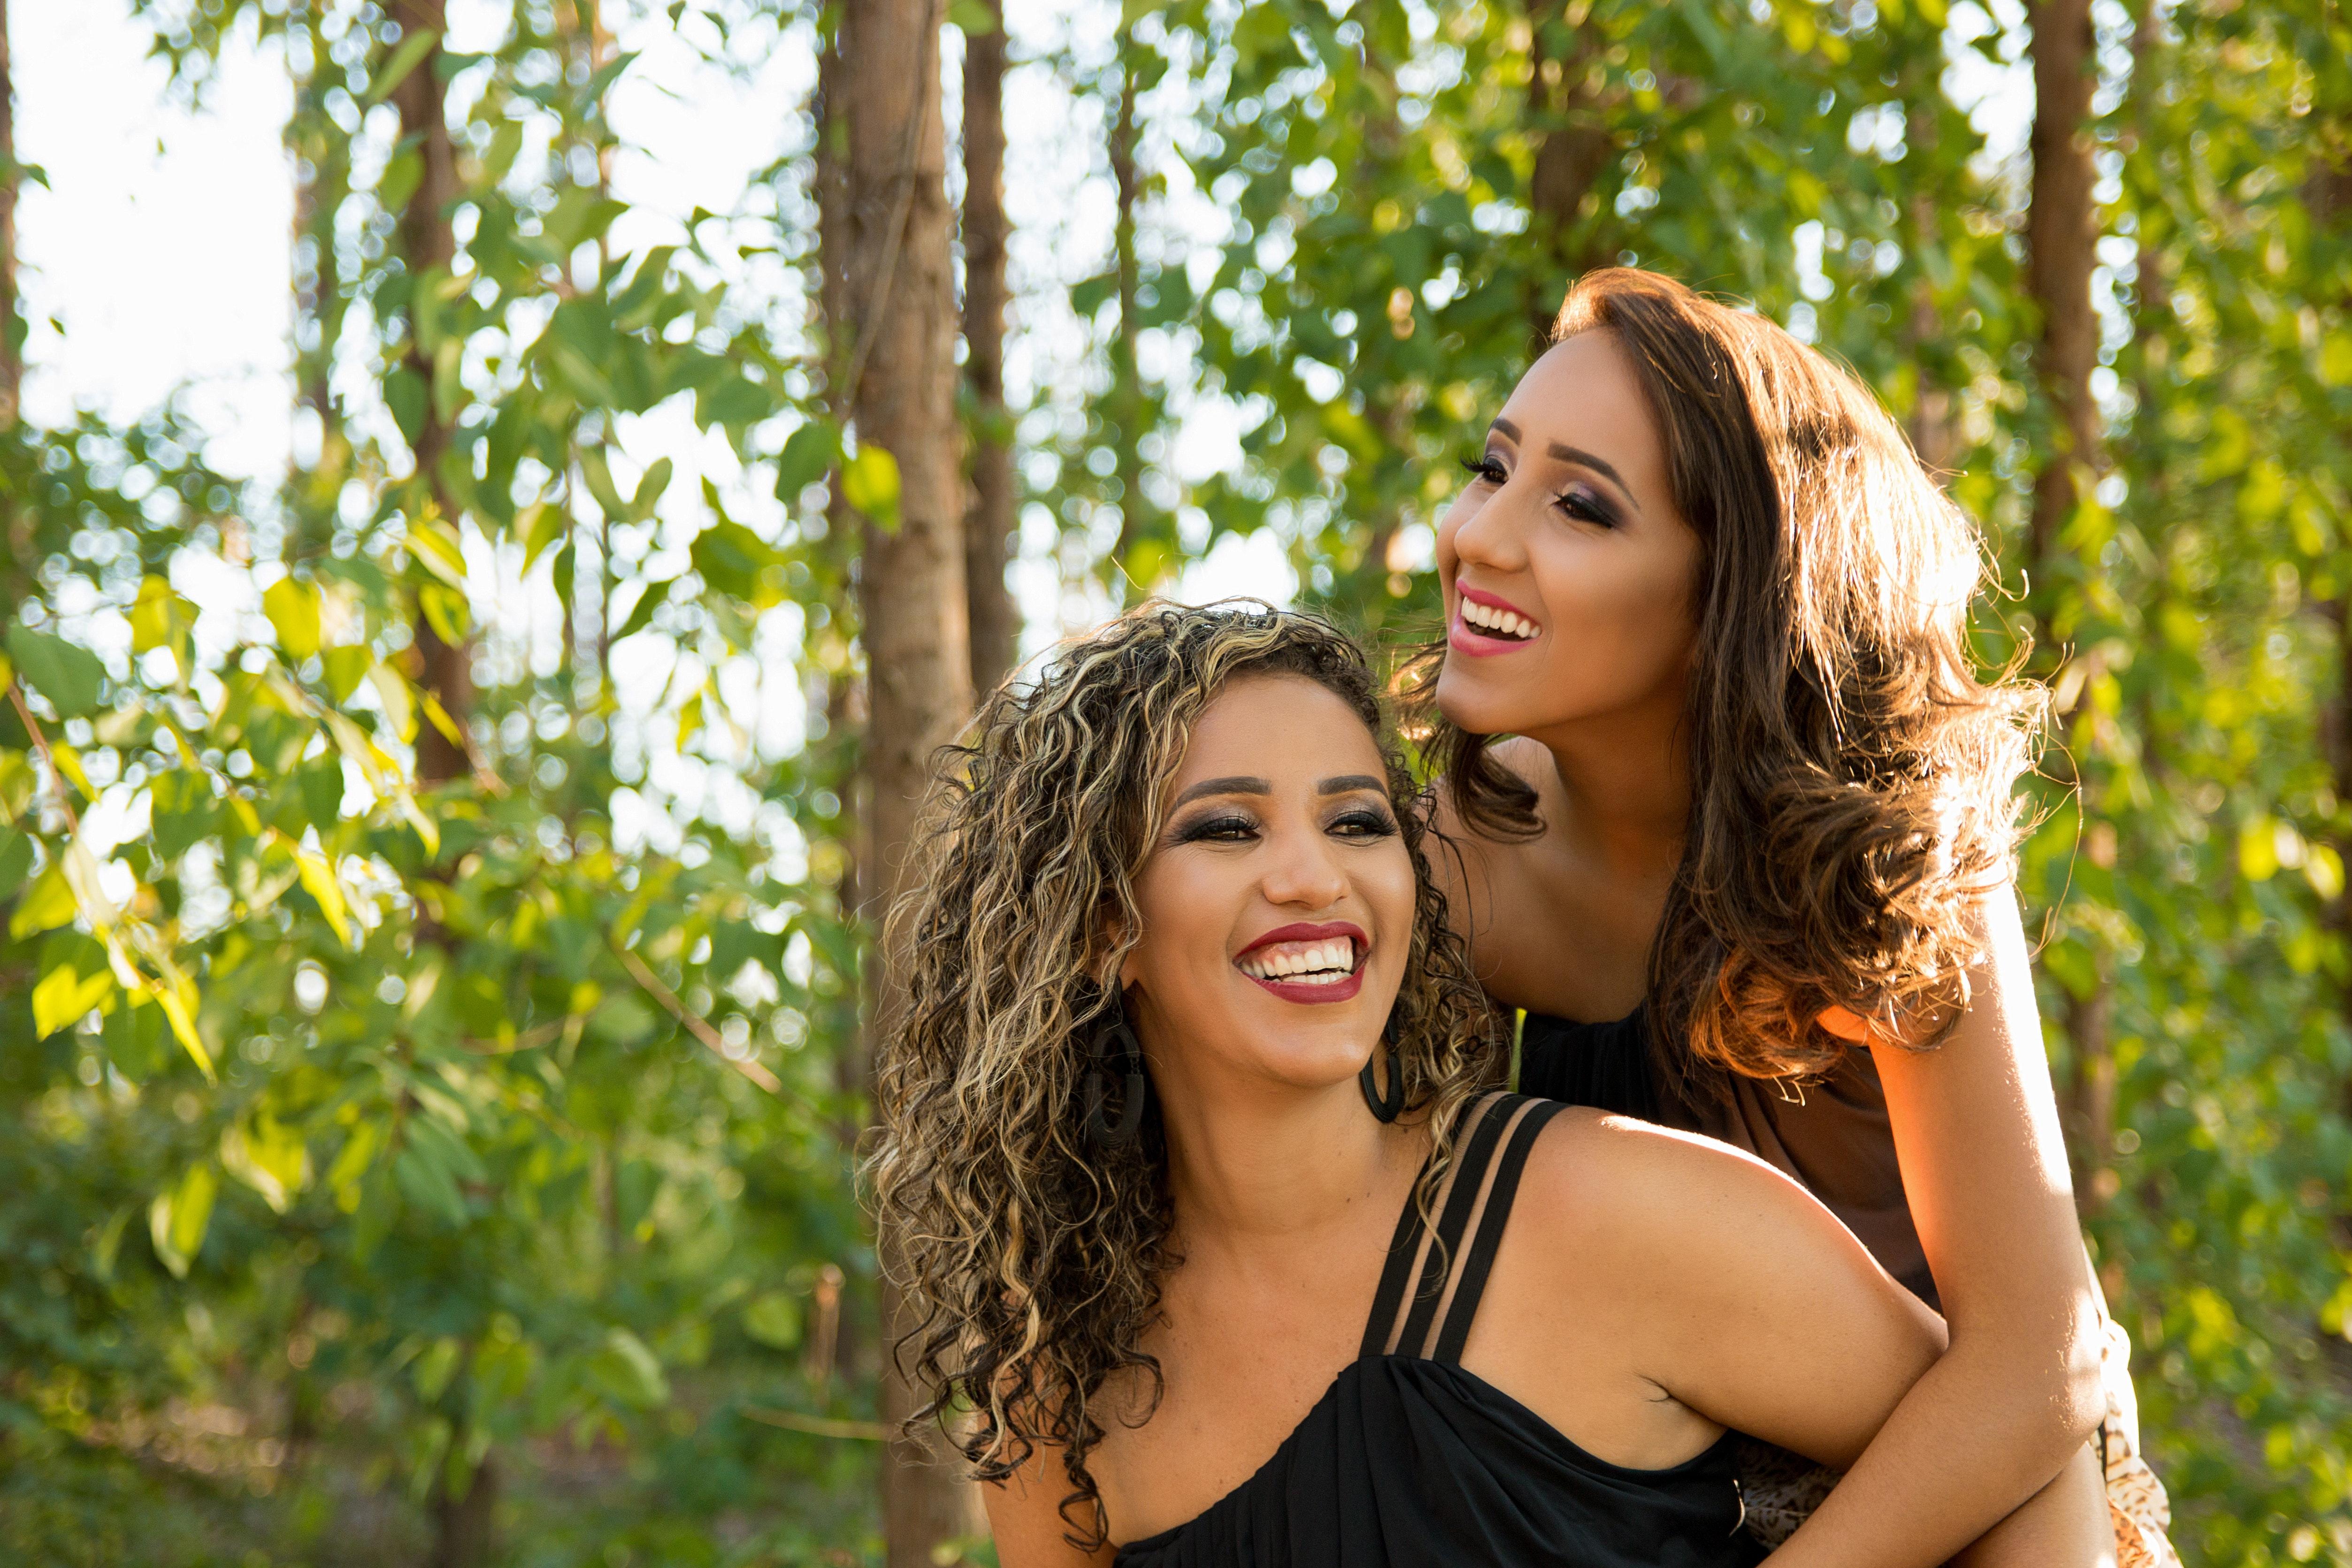 Two women at daytime photo